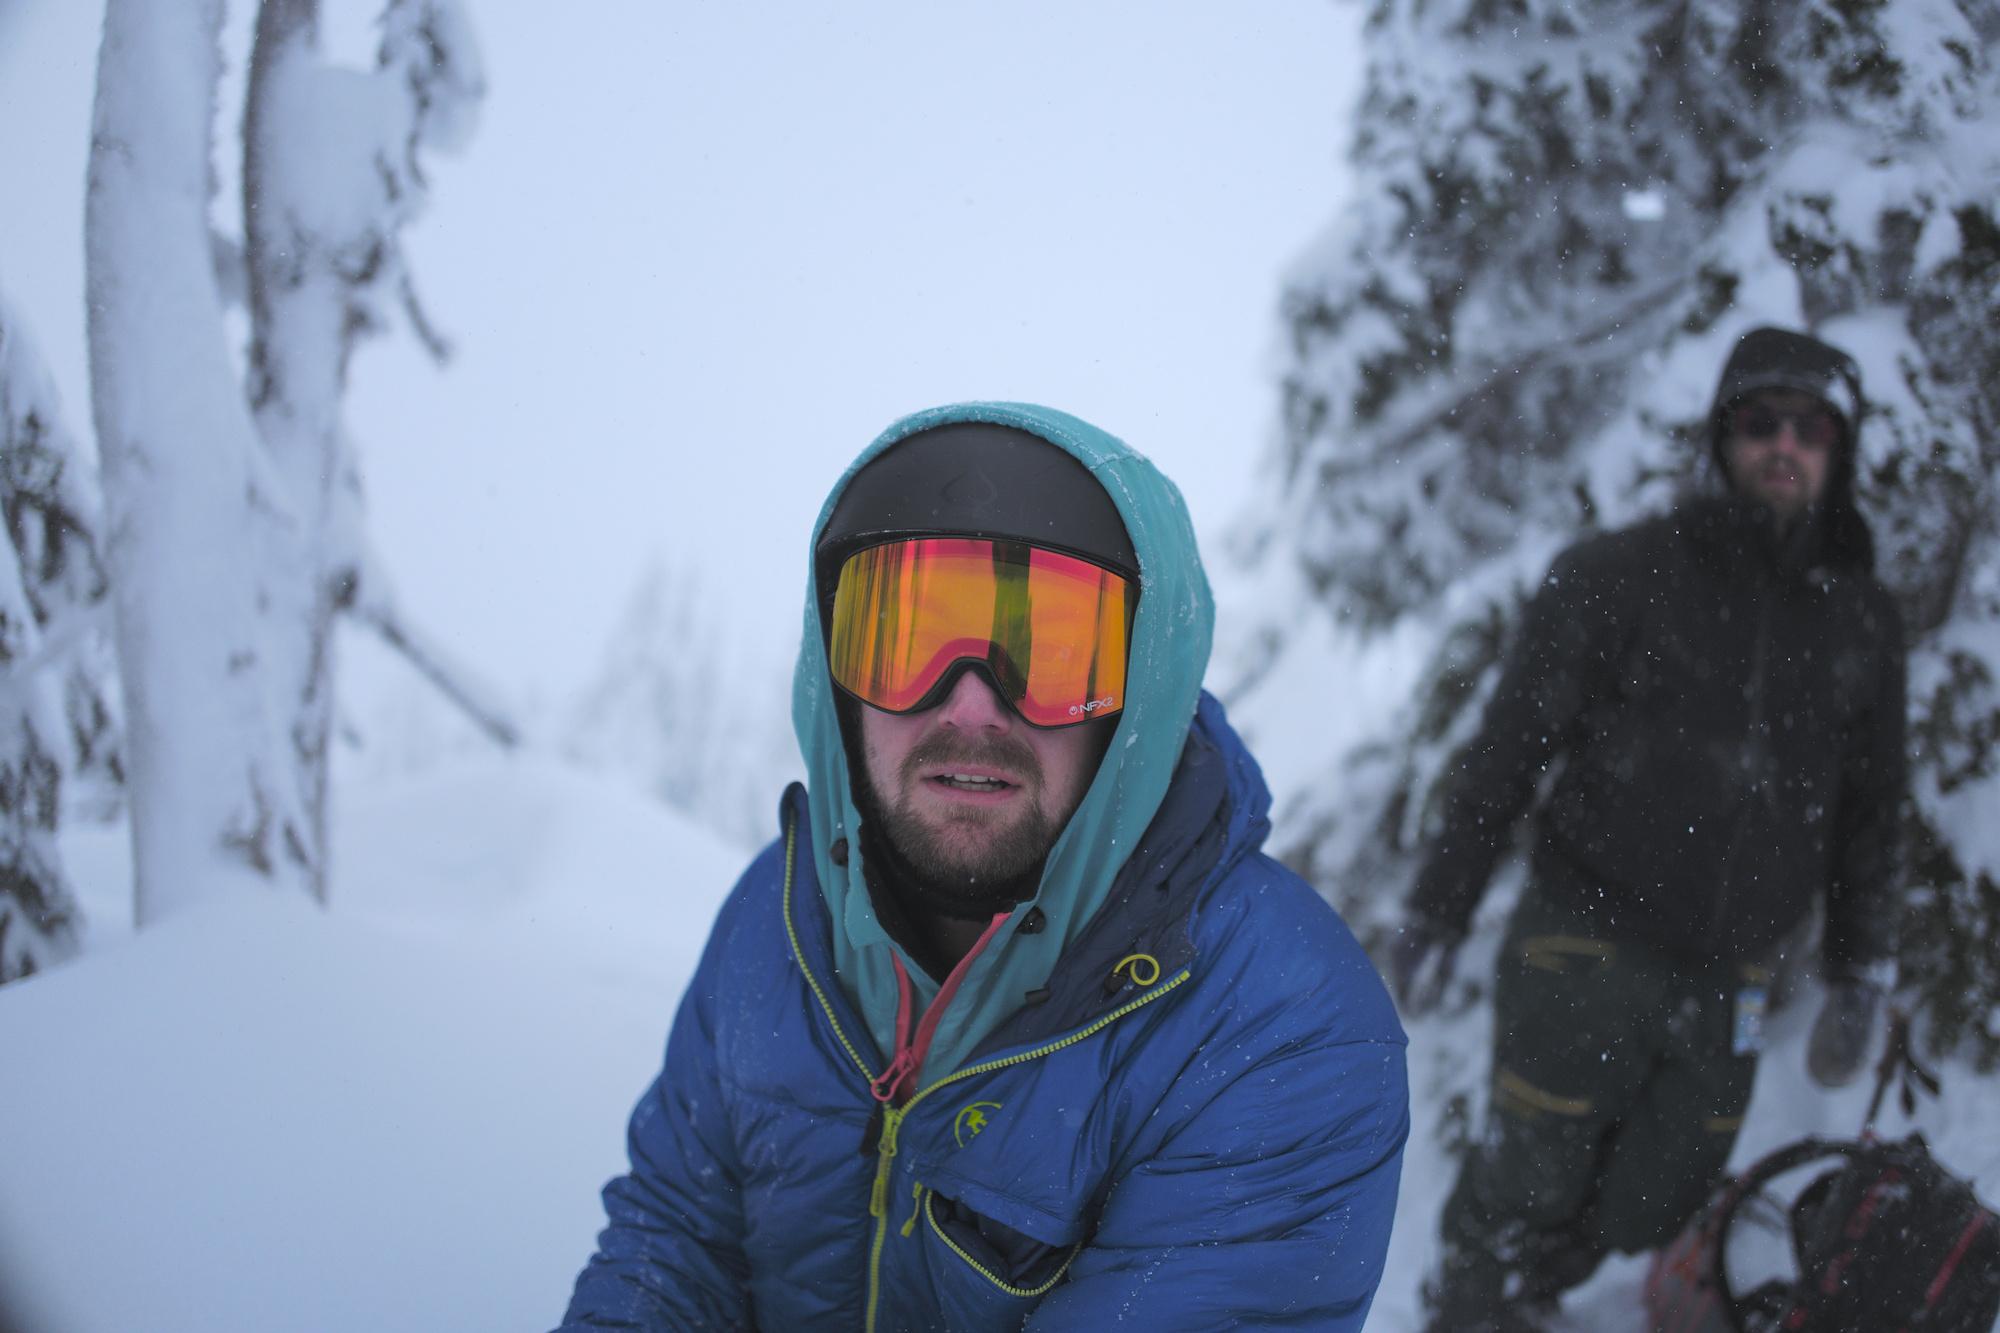 Mt. Baker, WA, Kyl, snowboarding, portraits